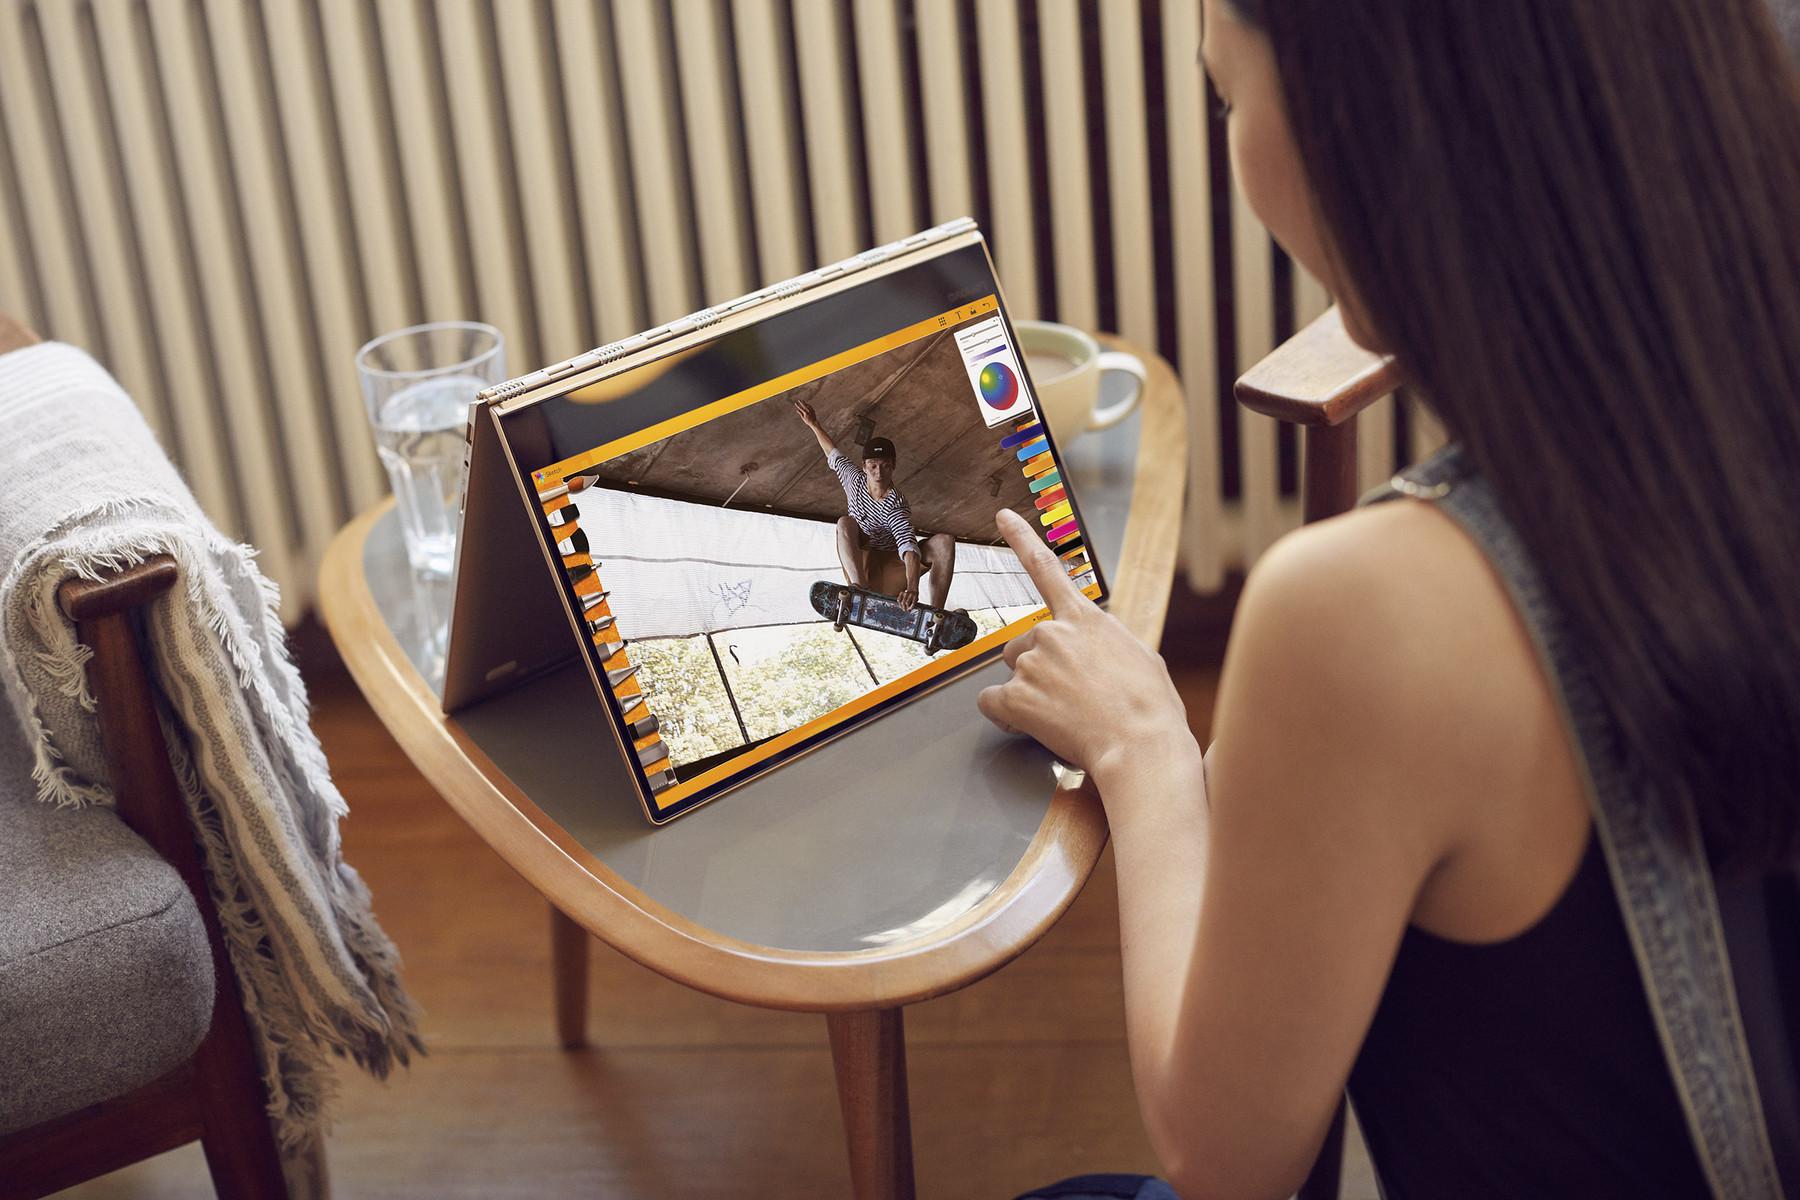 Tent-Mode & Lenovo Yoga 910: Convertible-flagship with Kaby Lake unibody ...